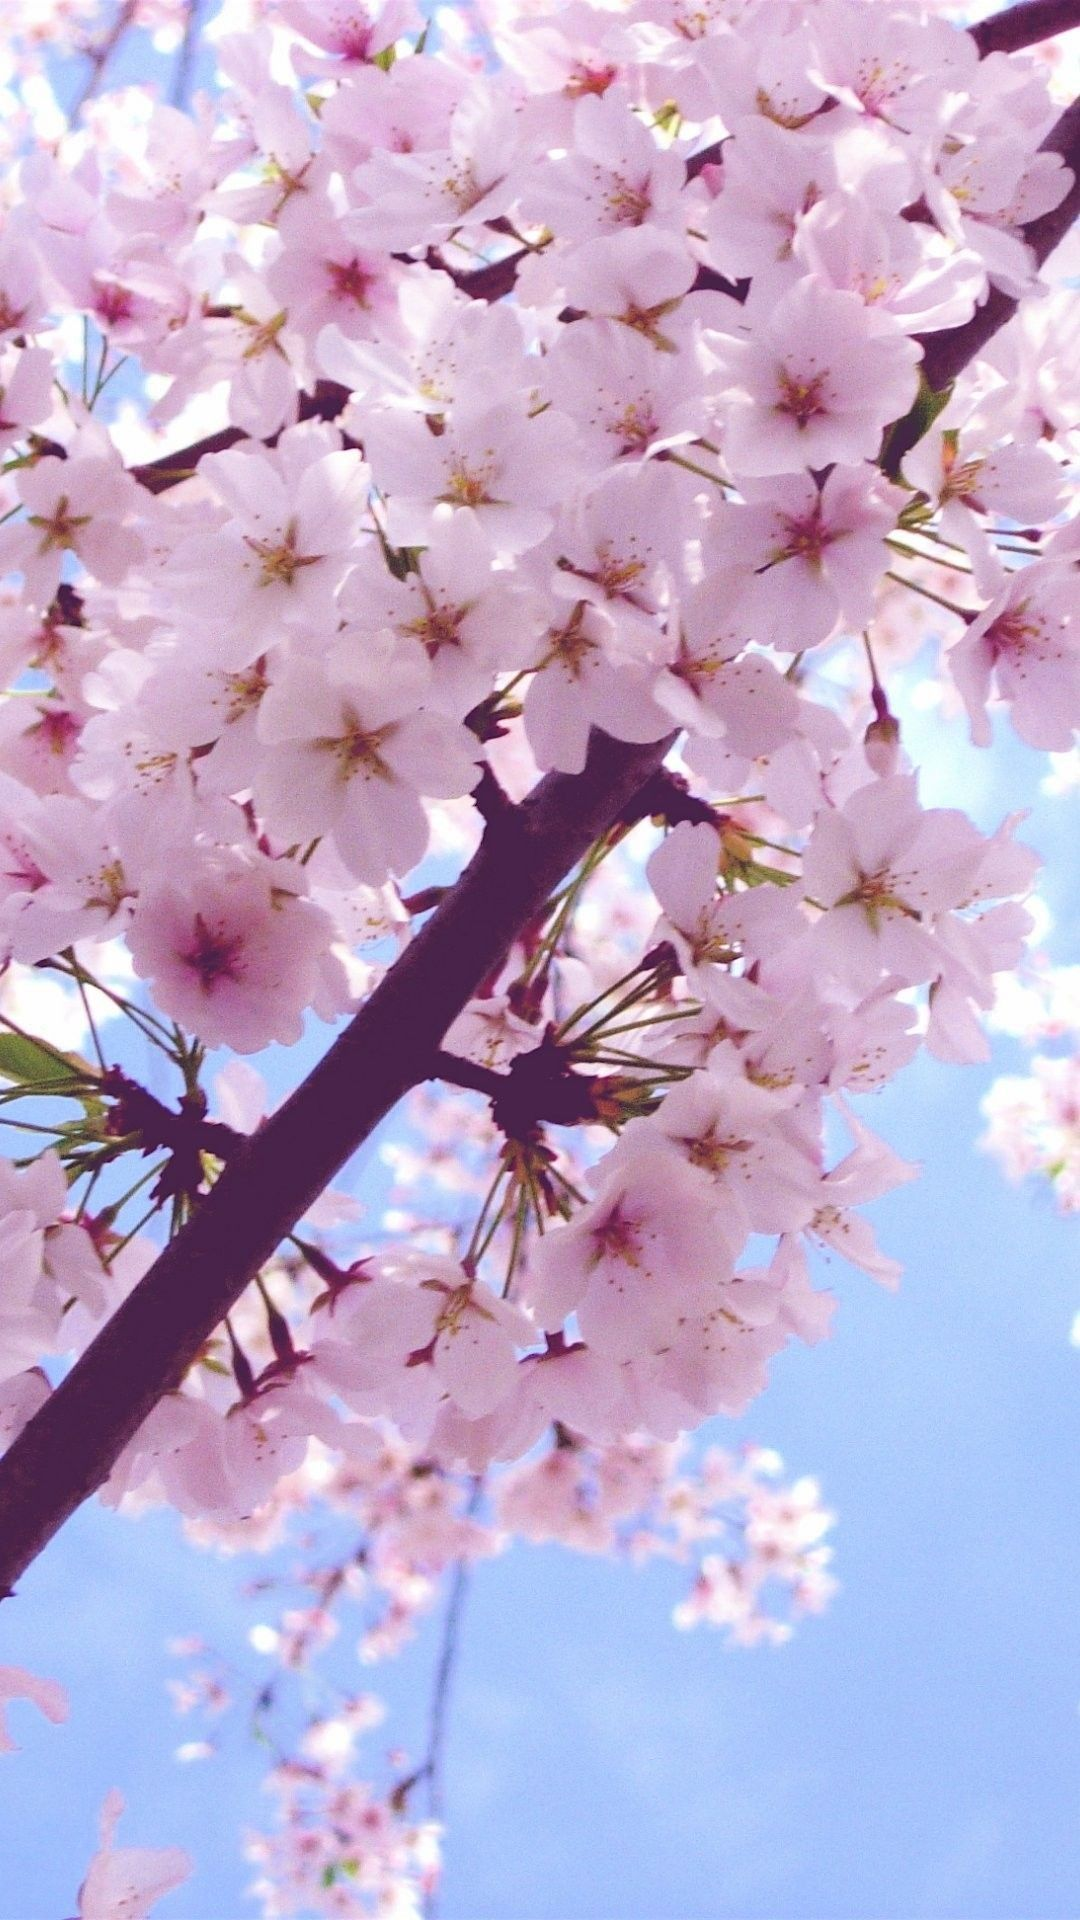 Beautiful Spring Wallpapers for iPhone Цвіт, Квіти